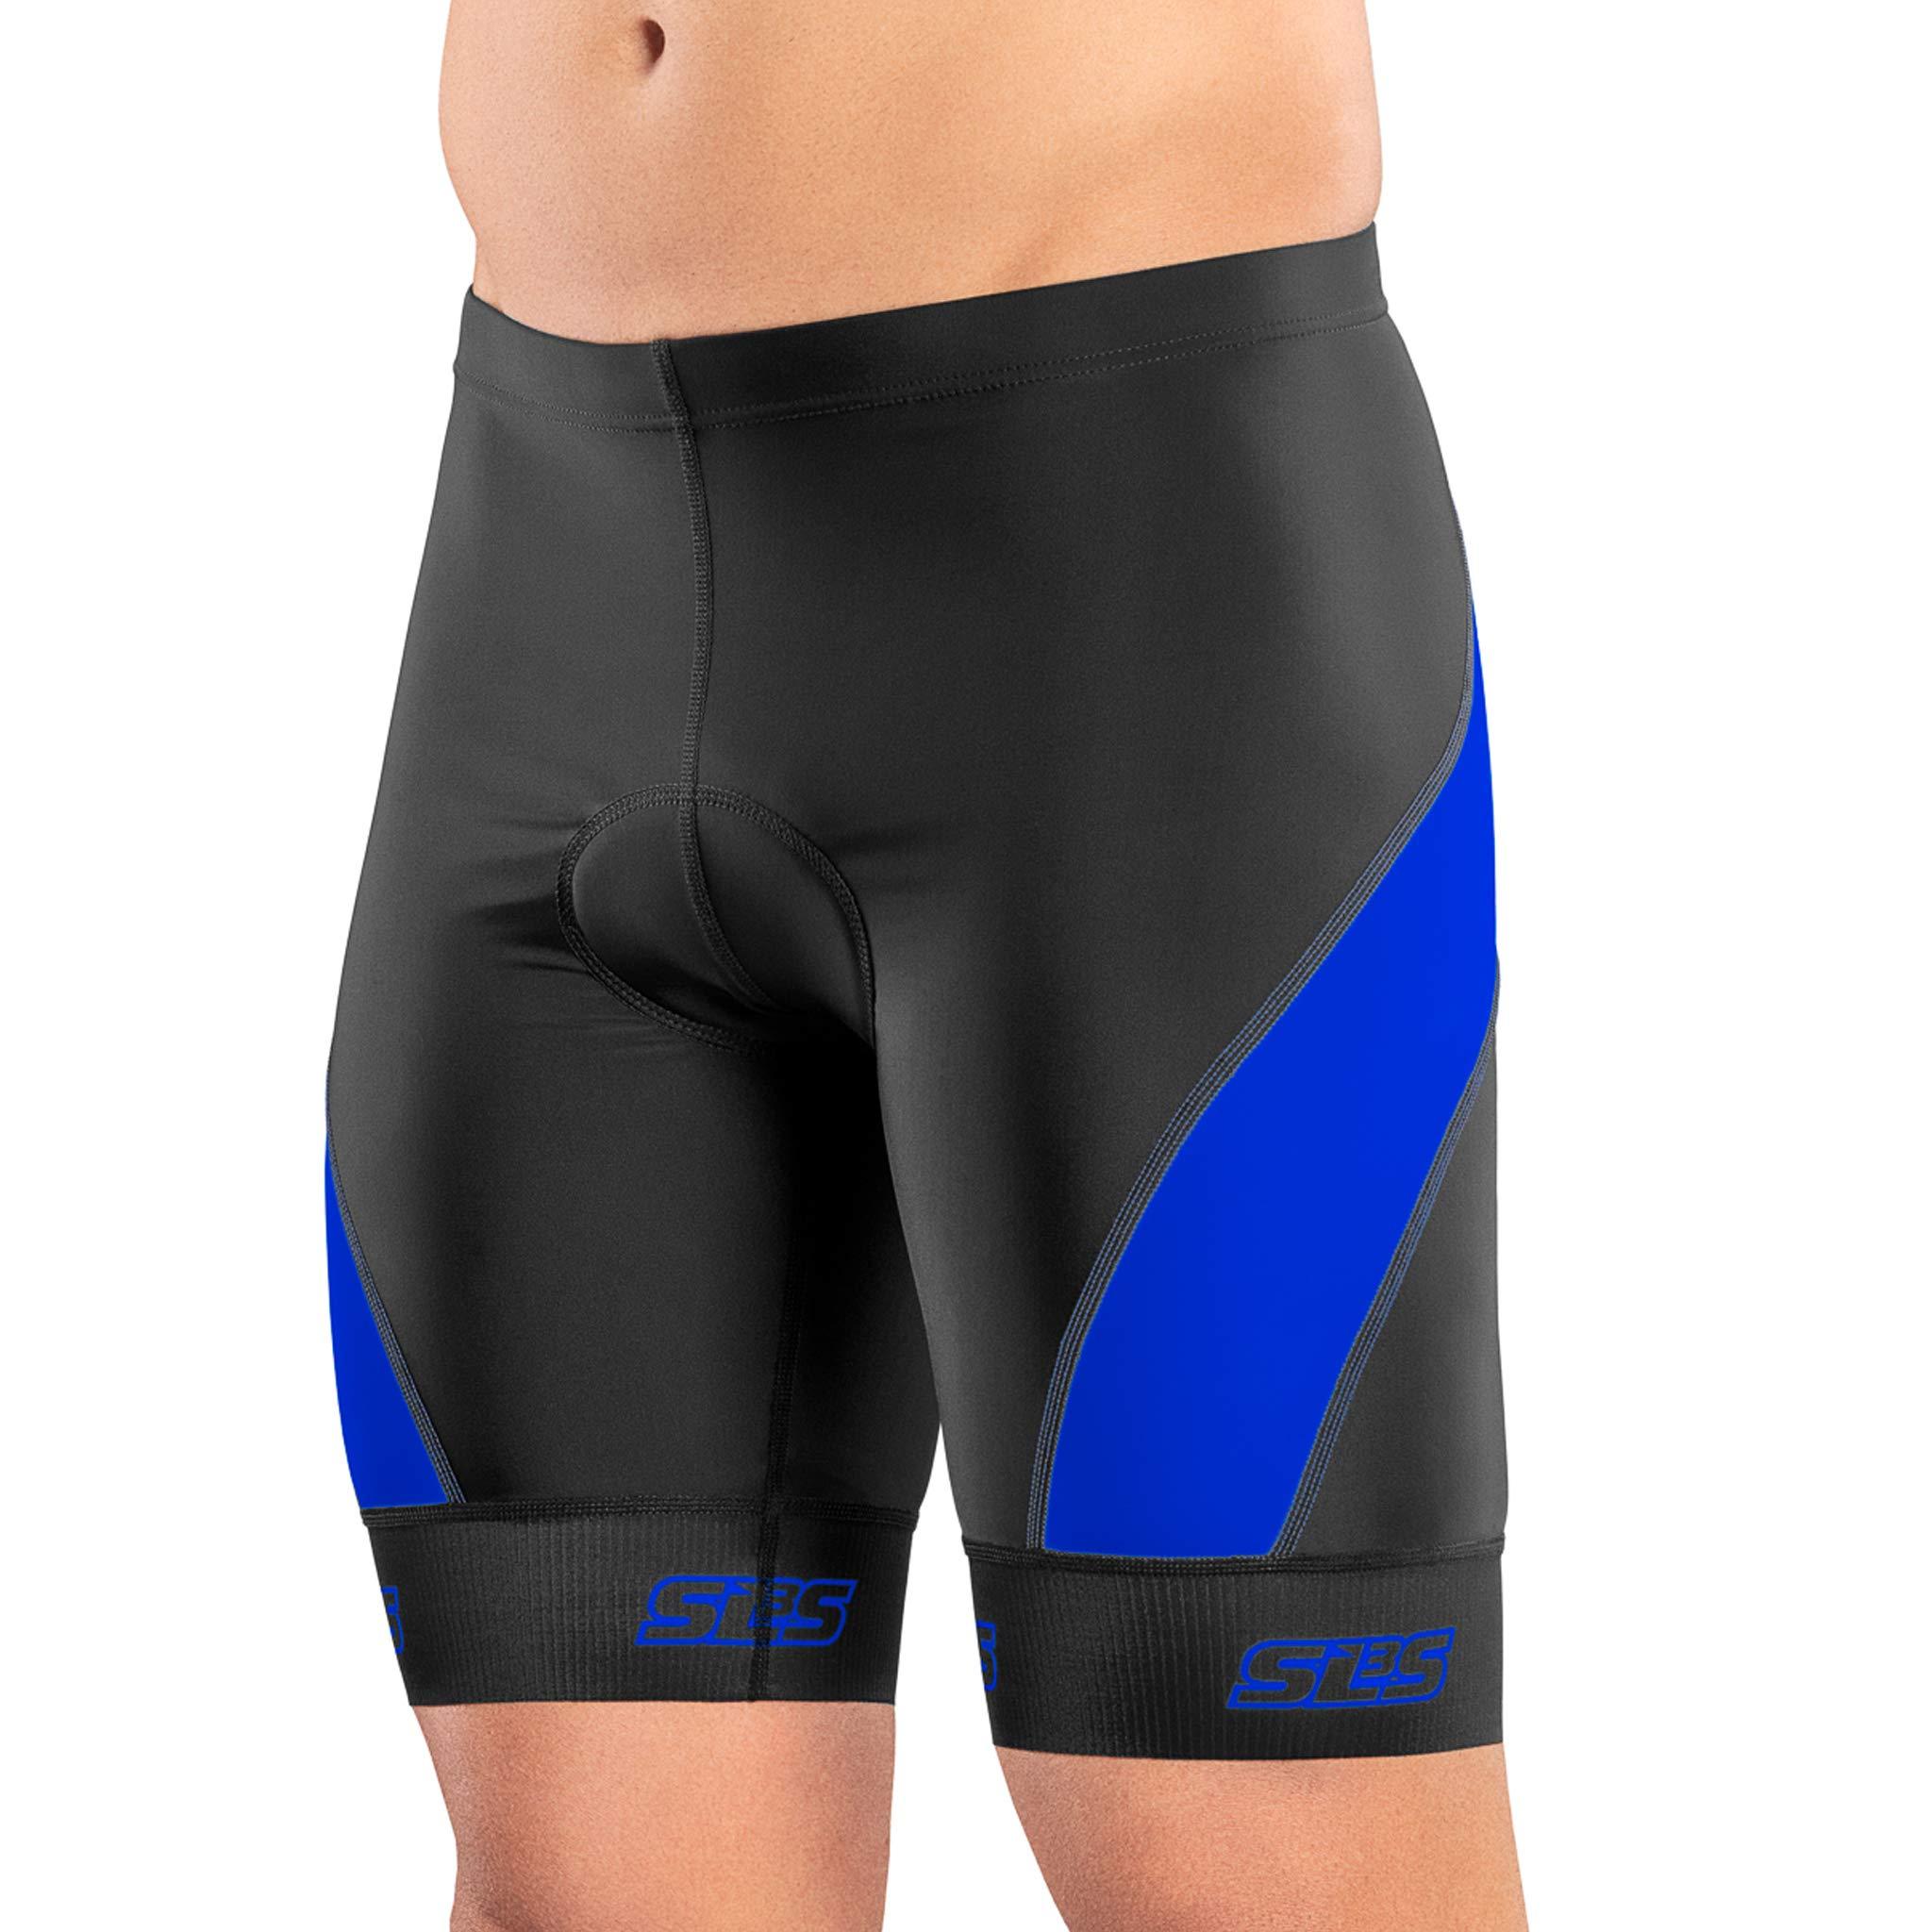 SLS3 FXZ Tri-Shorts - Indoor Cycling - Pocket - Mens Triathlon Shorts 8 inch (Black/Blue, S)